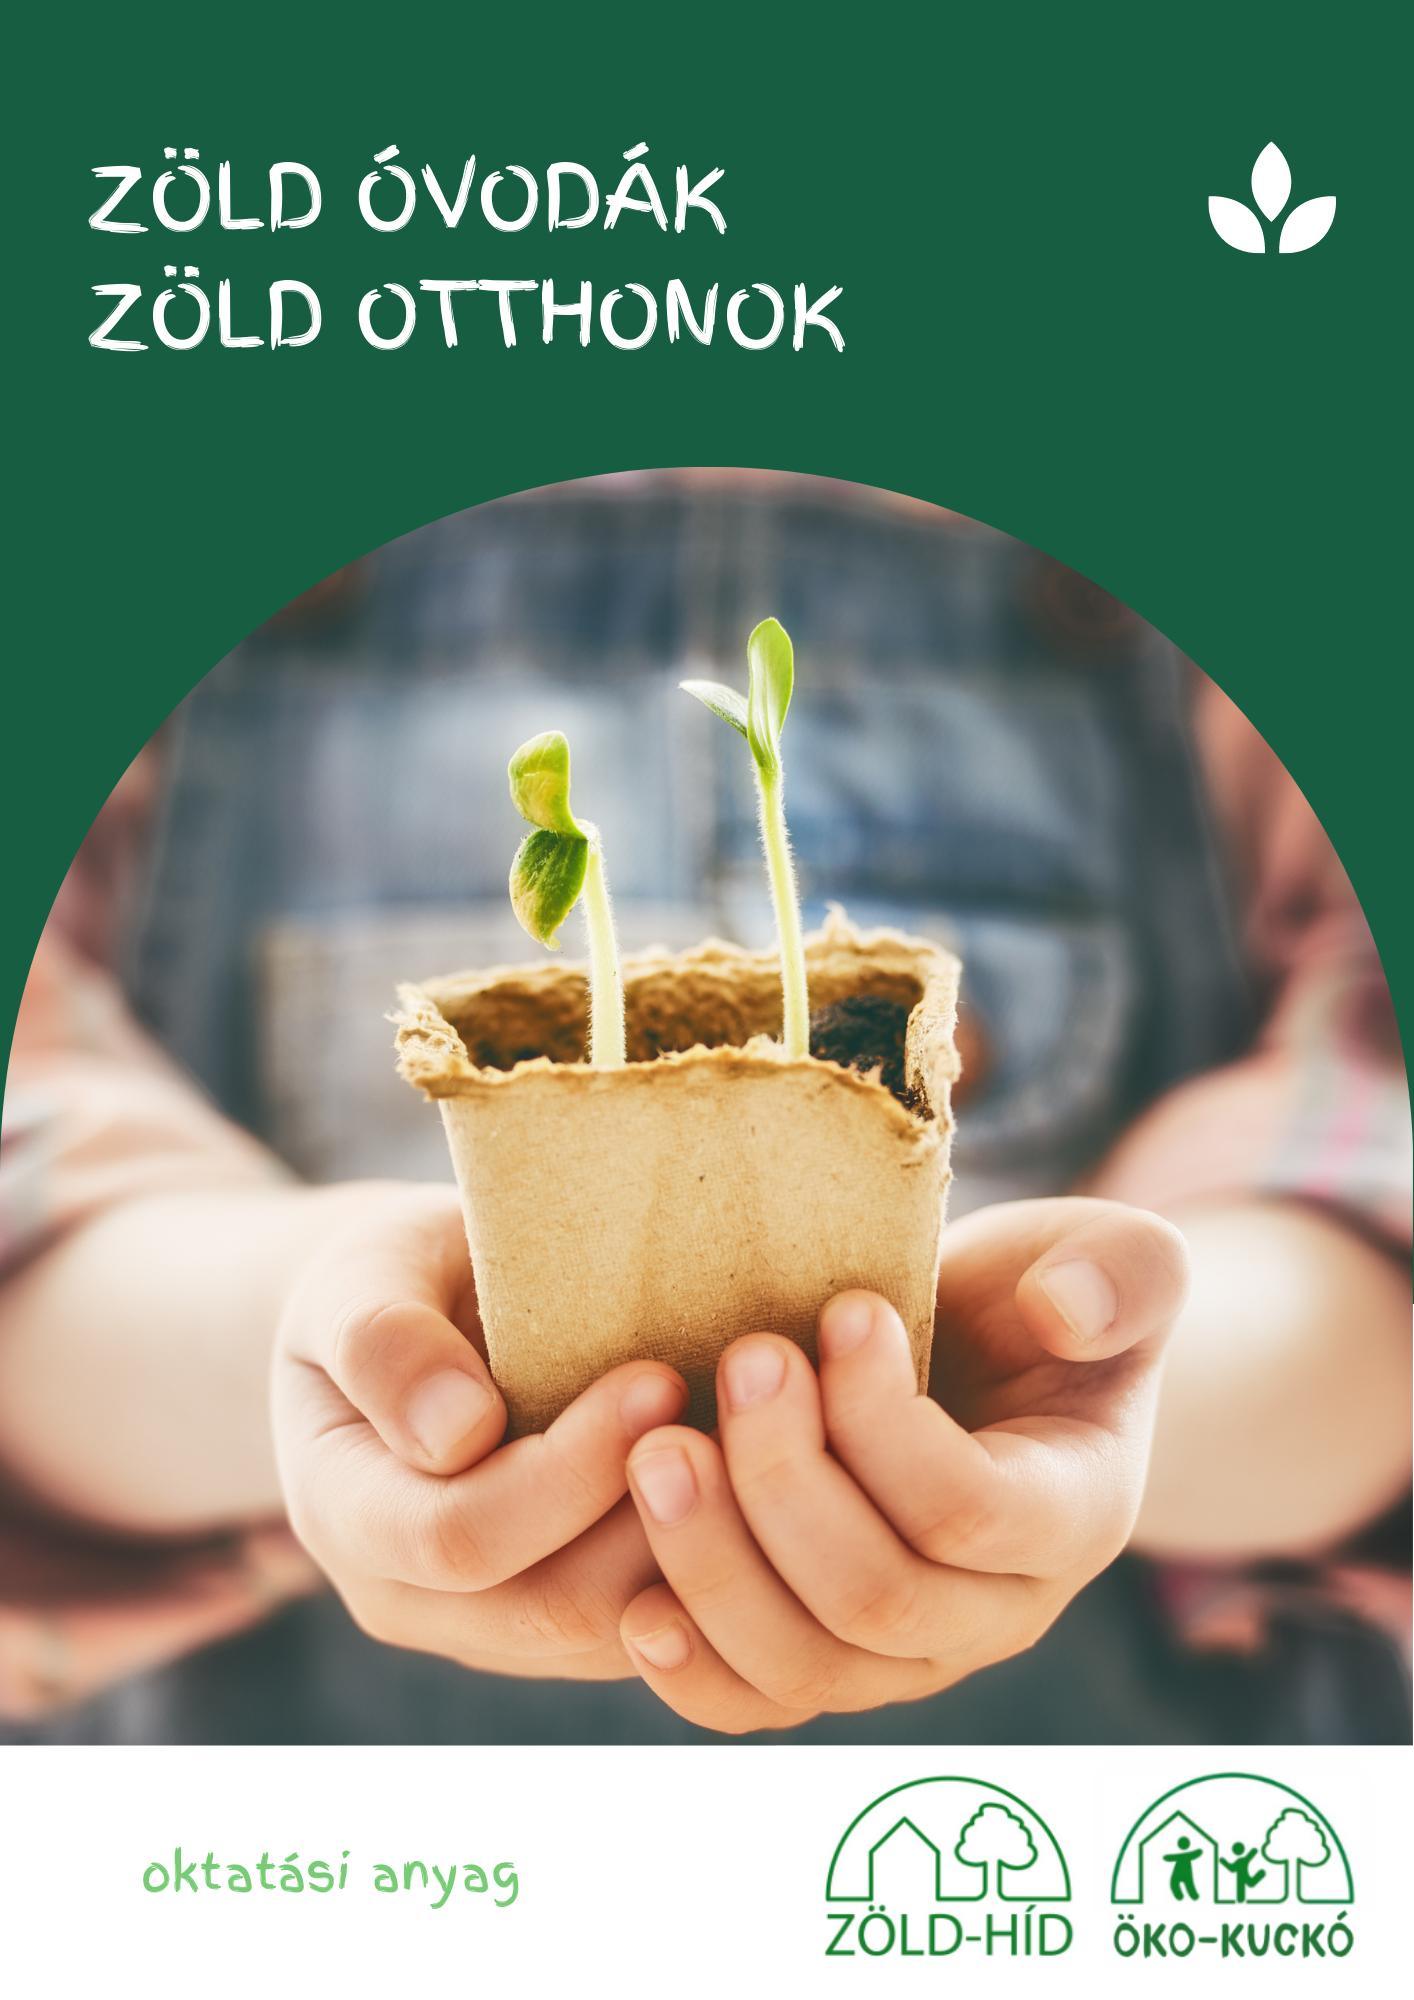 zold_ovodak-zold_otthonok_2021.png